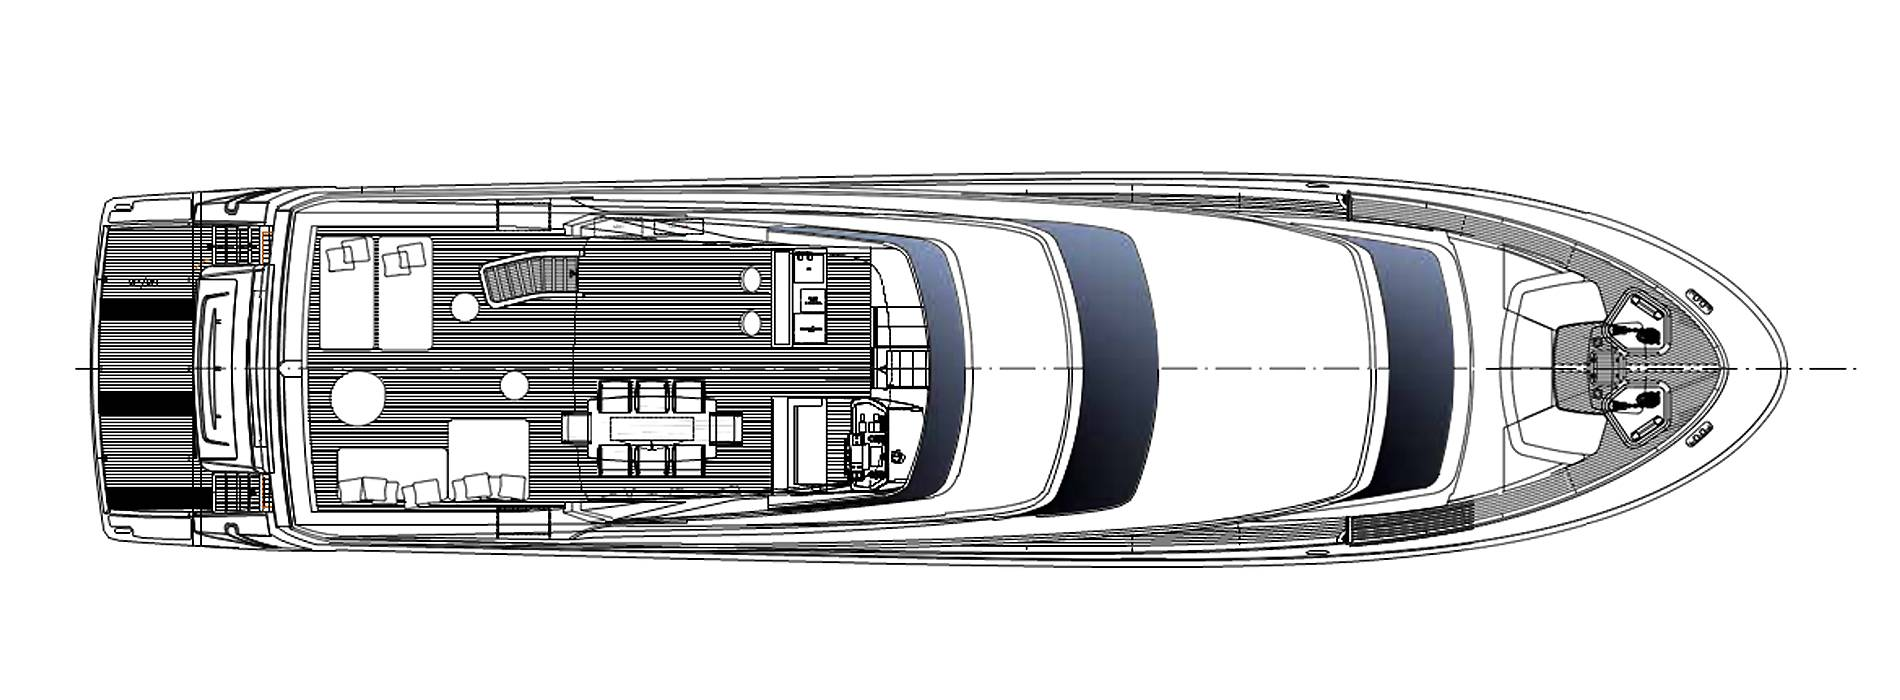 Sanlorenzo Yachts SL96-623 Flying bridge